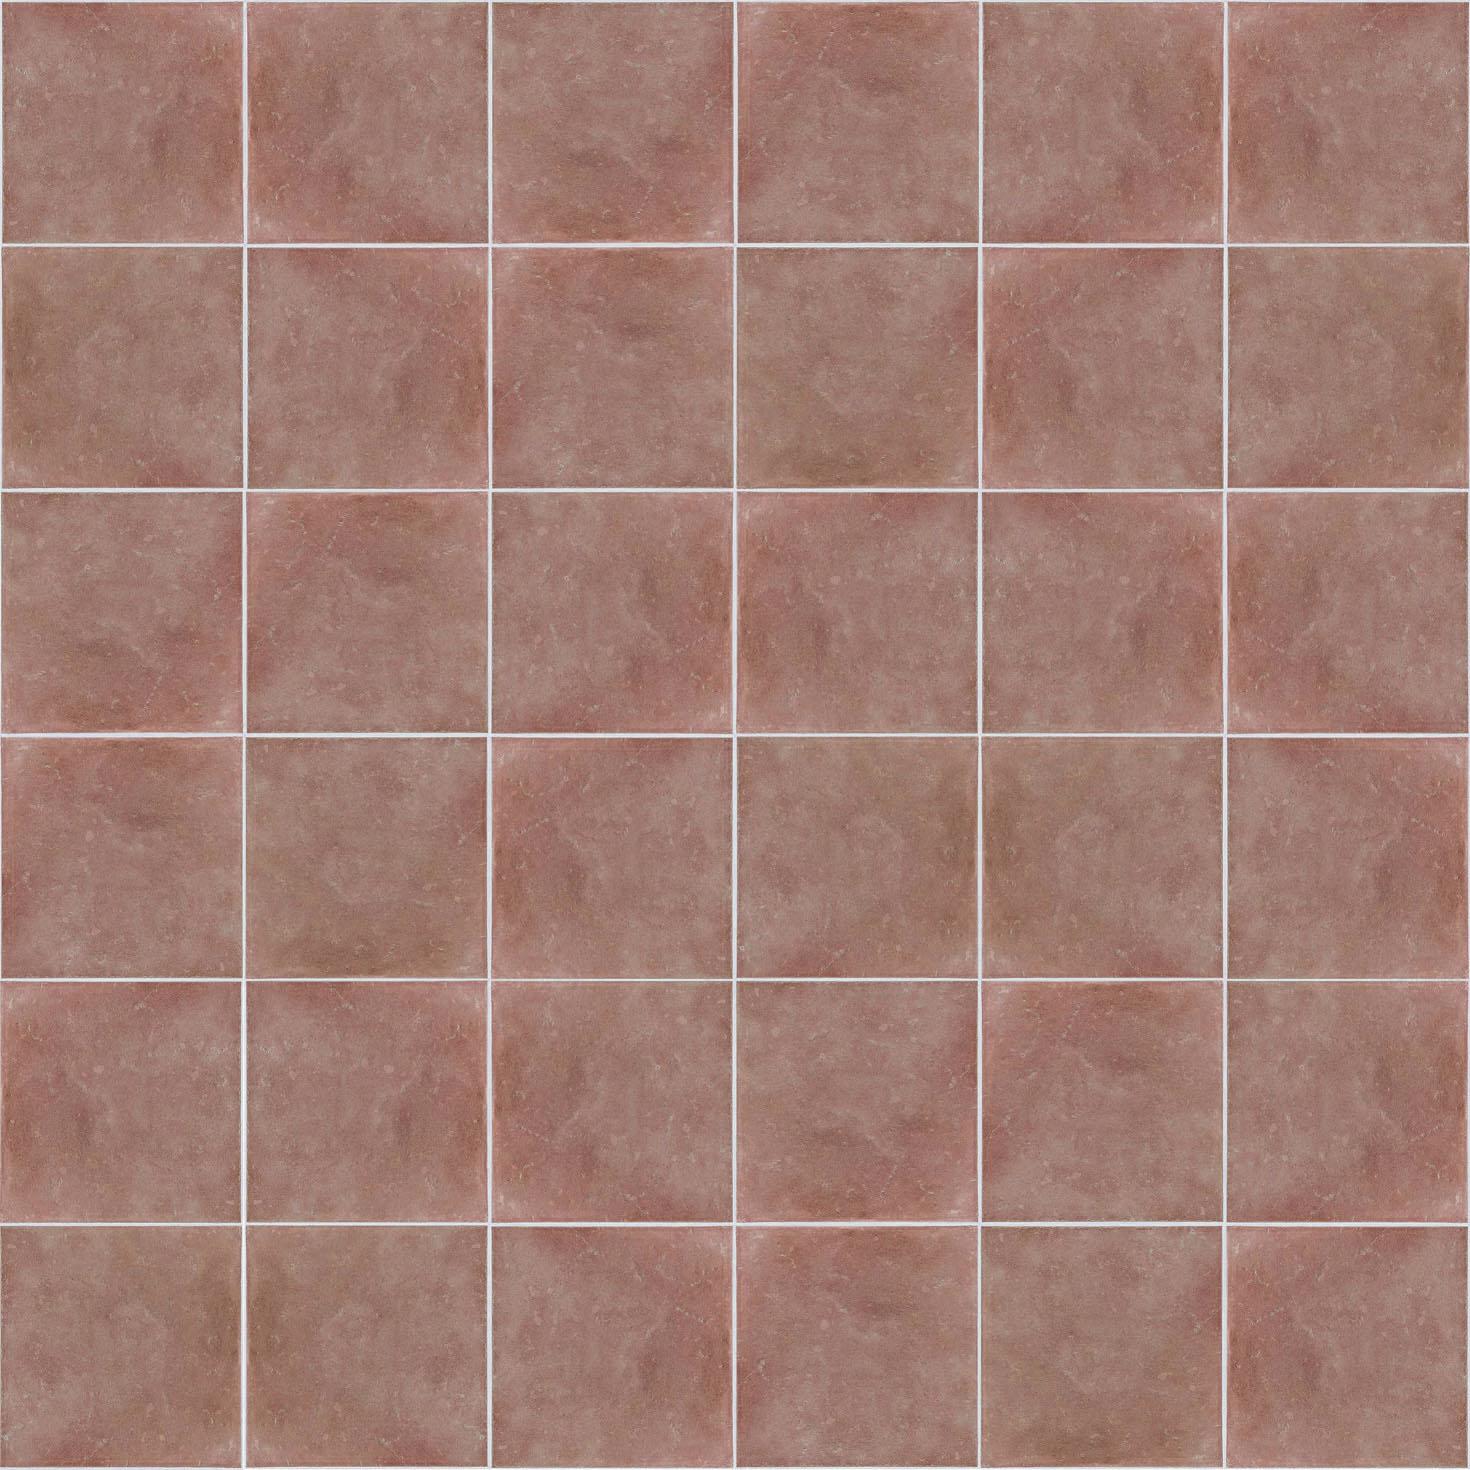 Simo 3d Blogspot Com Texture Seamless Rivestimento Vari Colori